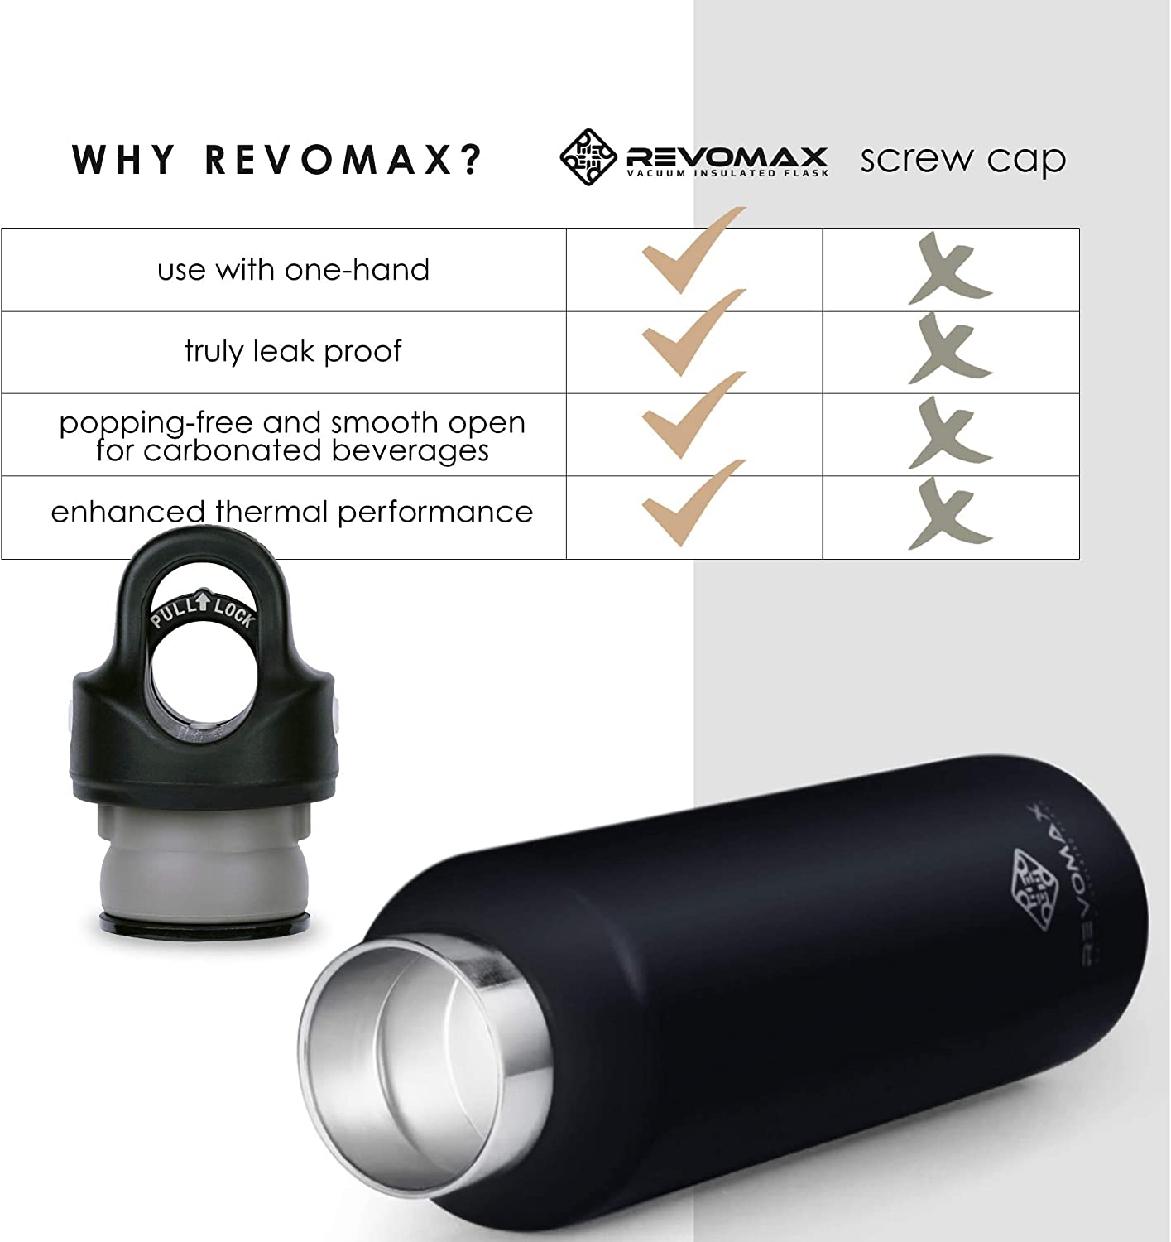 REVOMAX(レボマックス) 真空断熱ボトル オニキスブラック 592mlの商品画像5